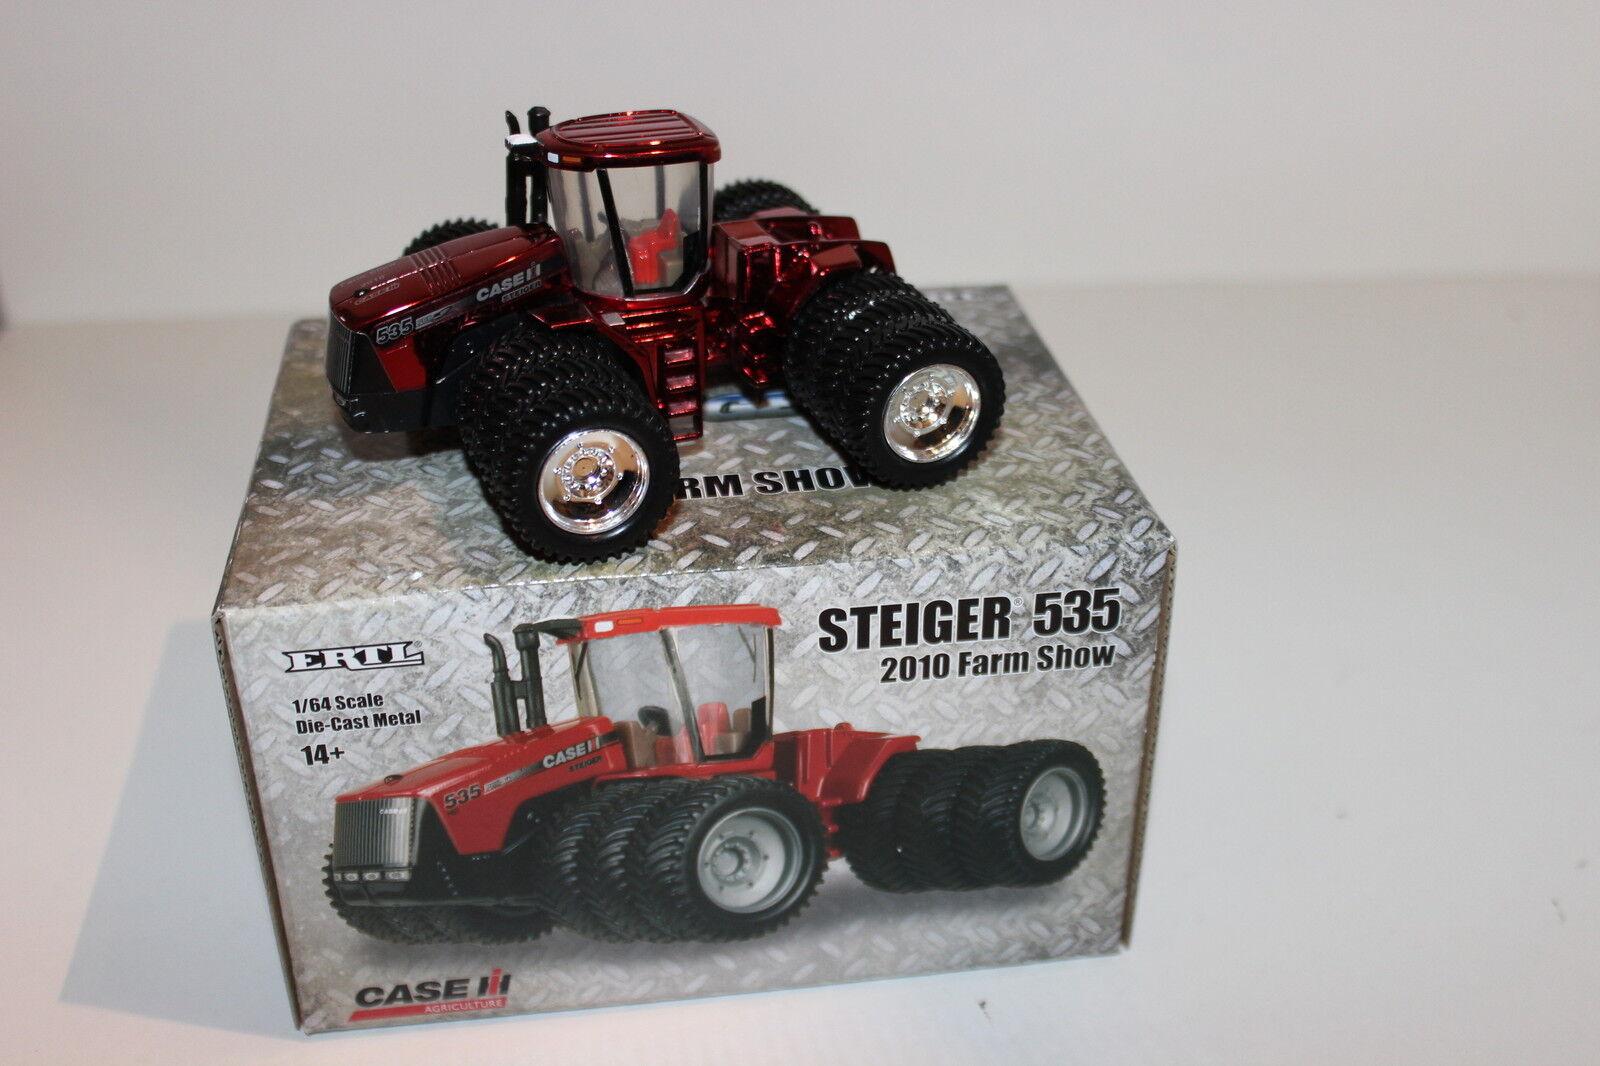 Ertl 1 64 Case IH Steiger 535 Chrome Chaser Chaser Chaser 2010 Farm Progress Show Tractor NIB e3f5e2